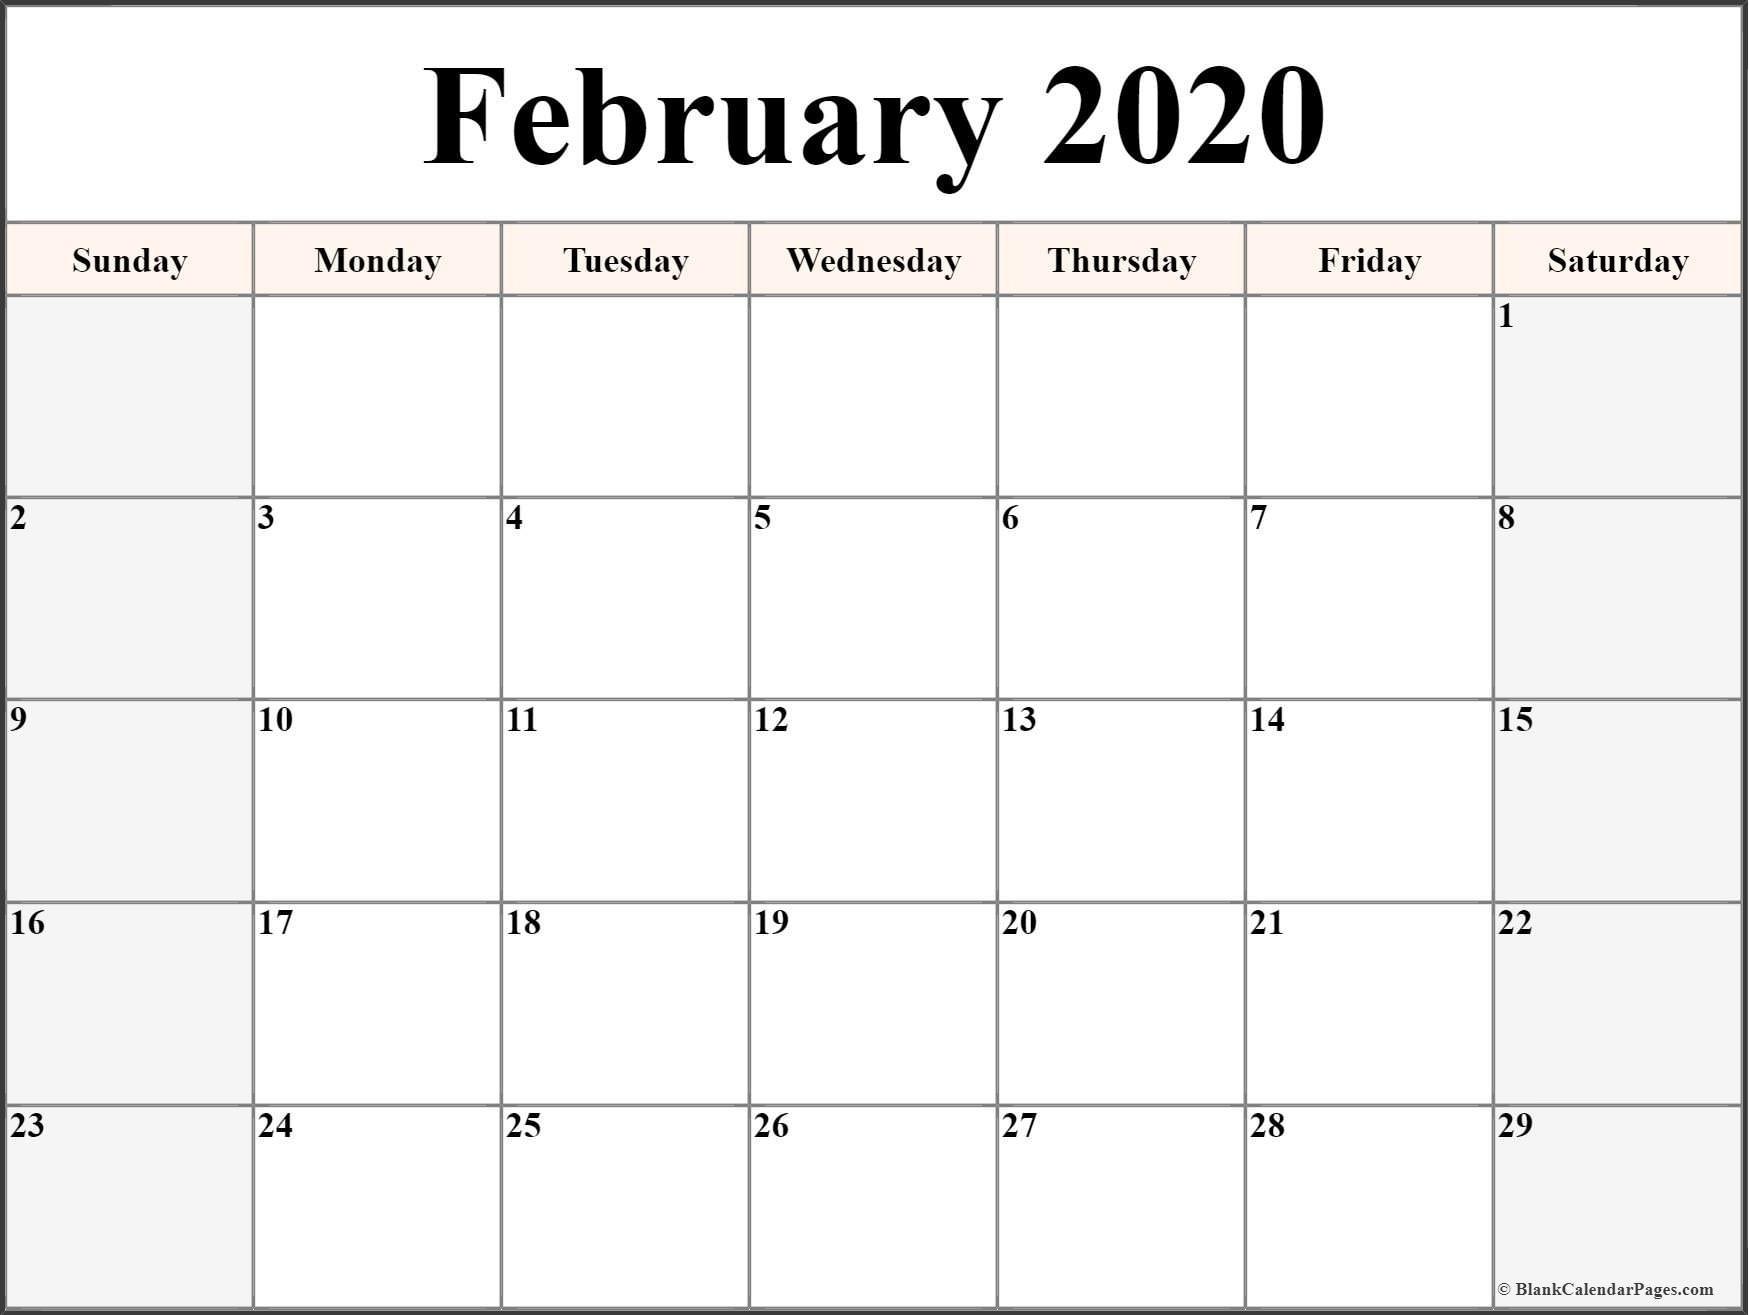 Firefighter Calendar 2020 Printable - Template Calendar Design  Firefighter Calendar Pdf